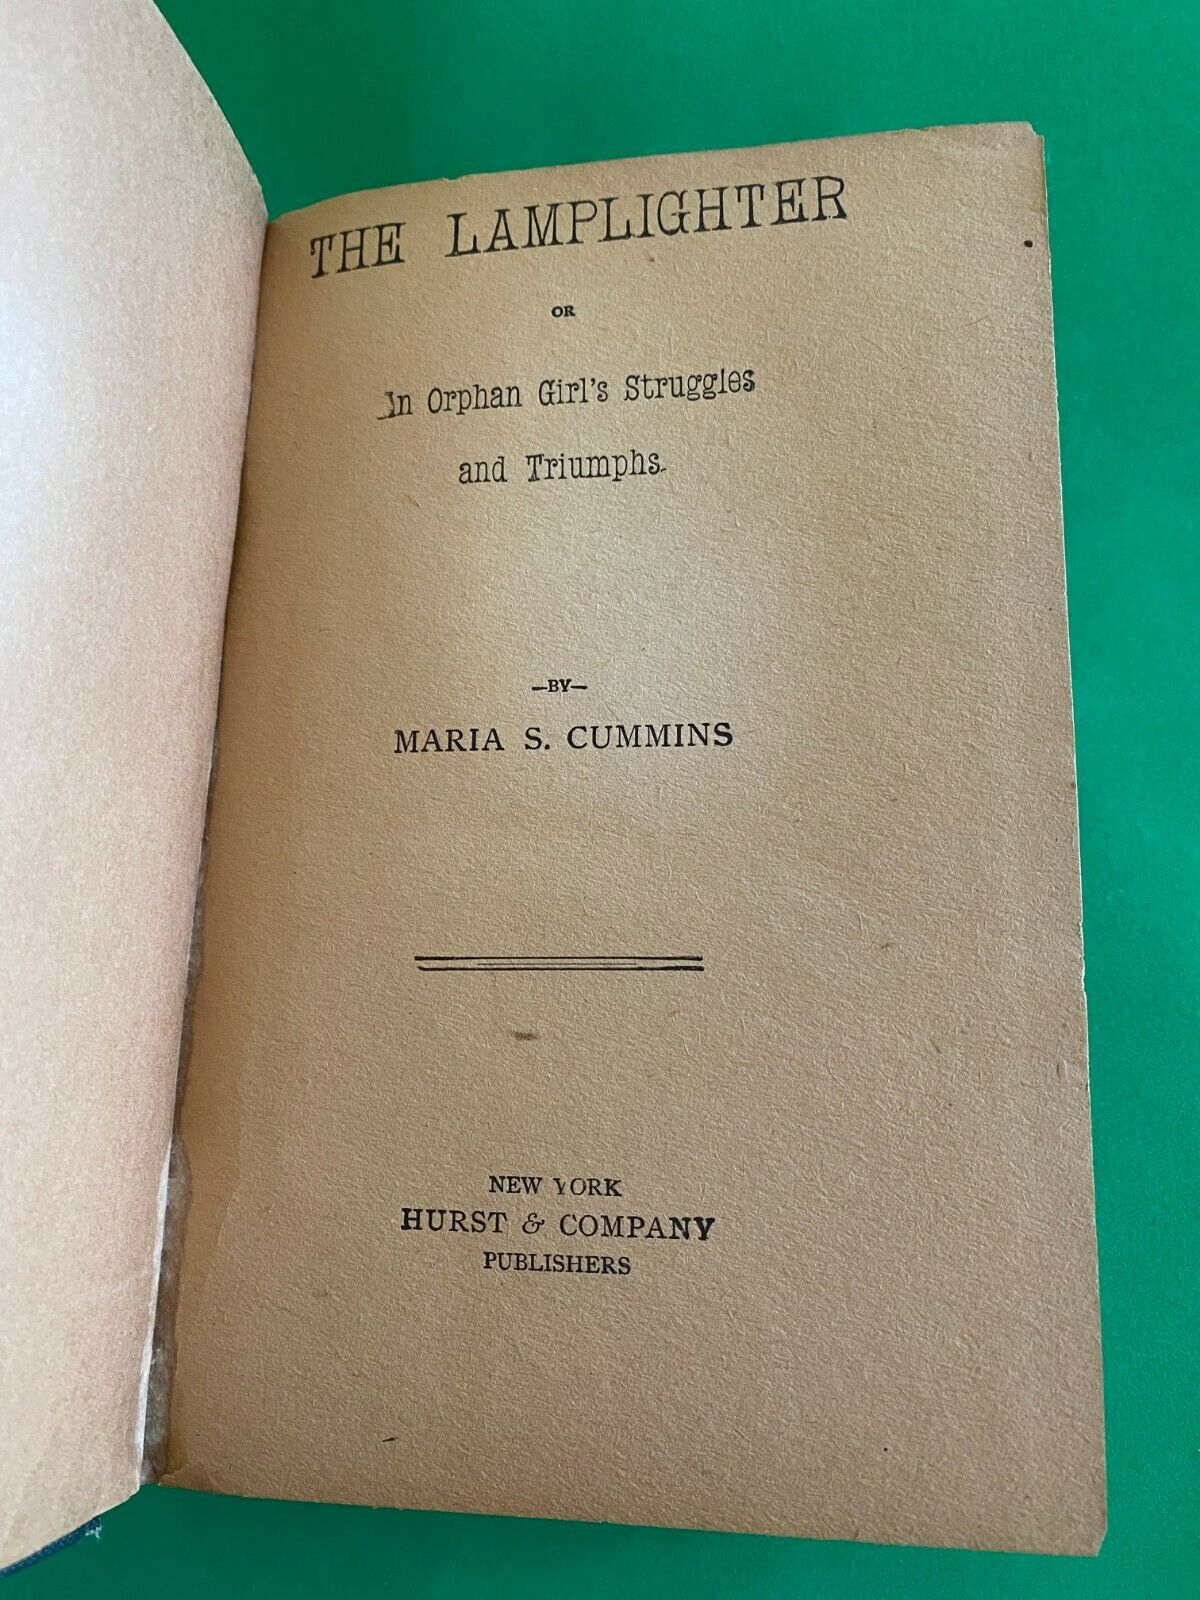 Lamplighter book image